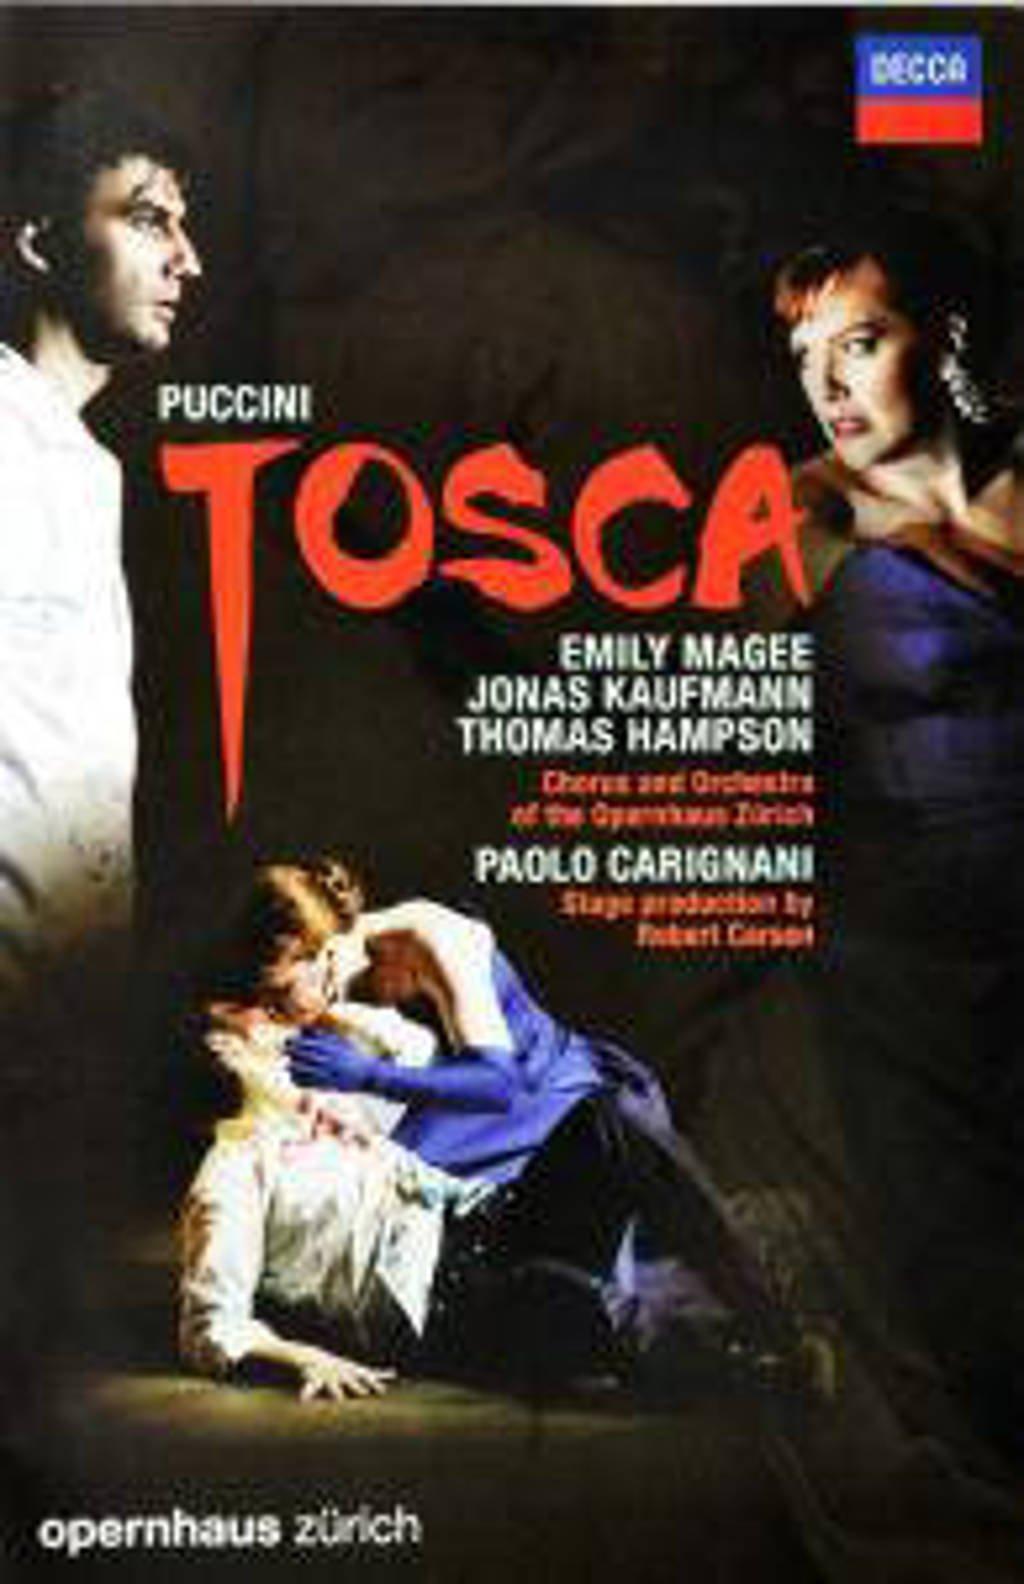 Jonas Kaufmann - Tosca (DVD)